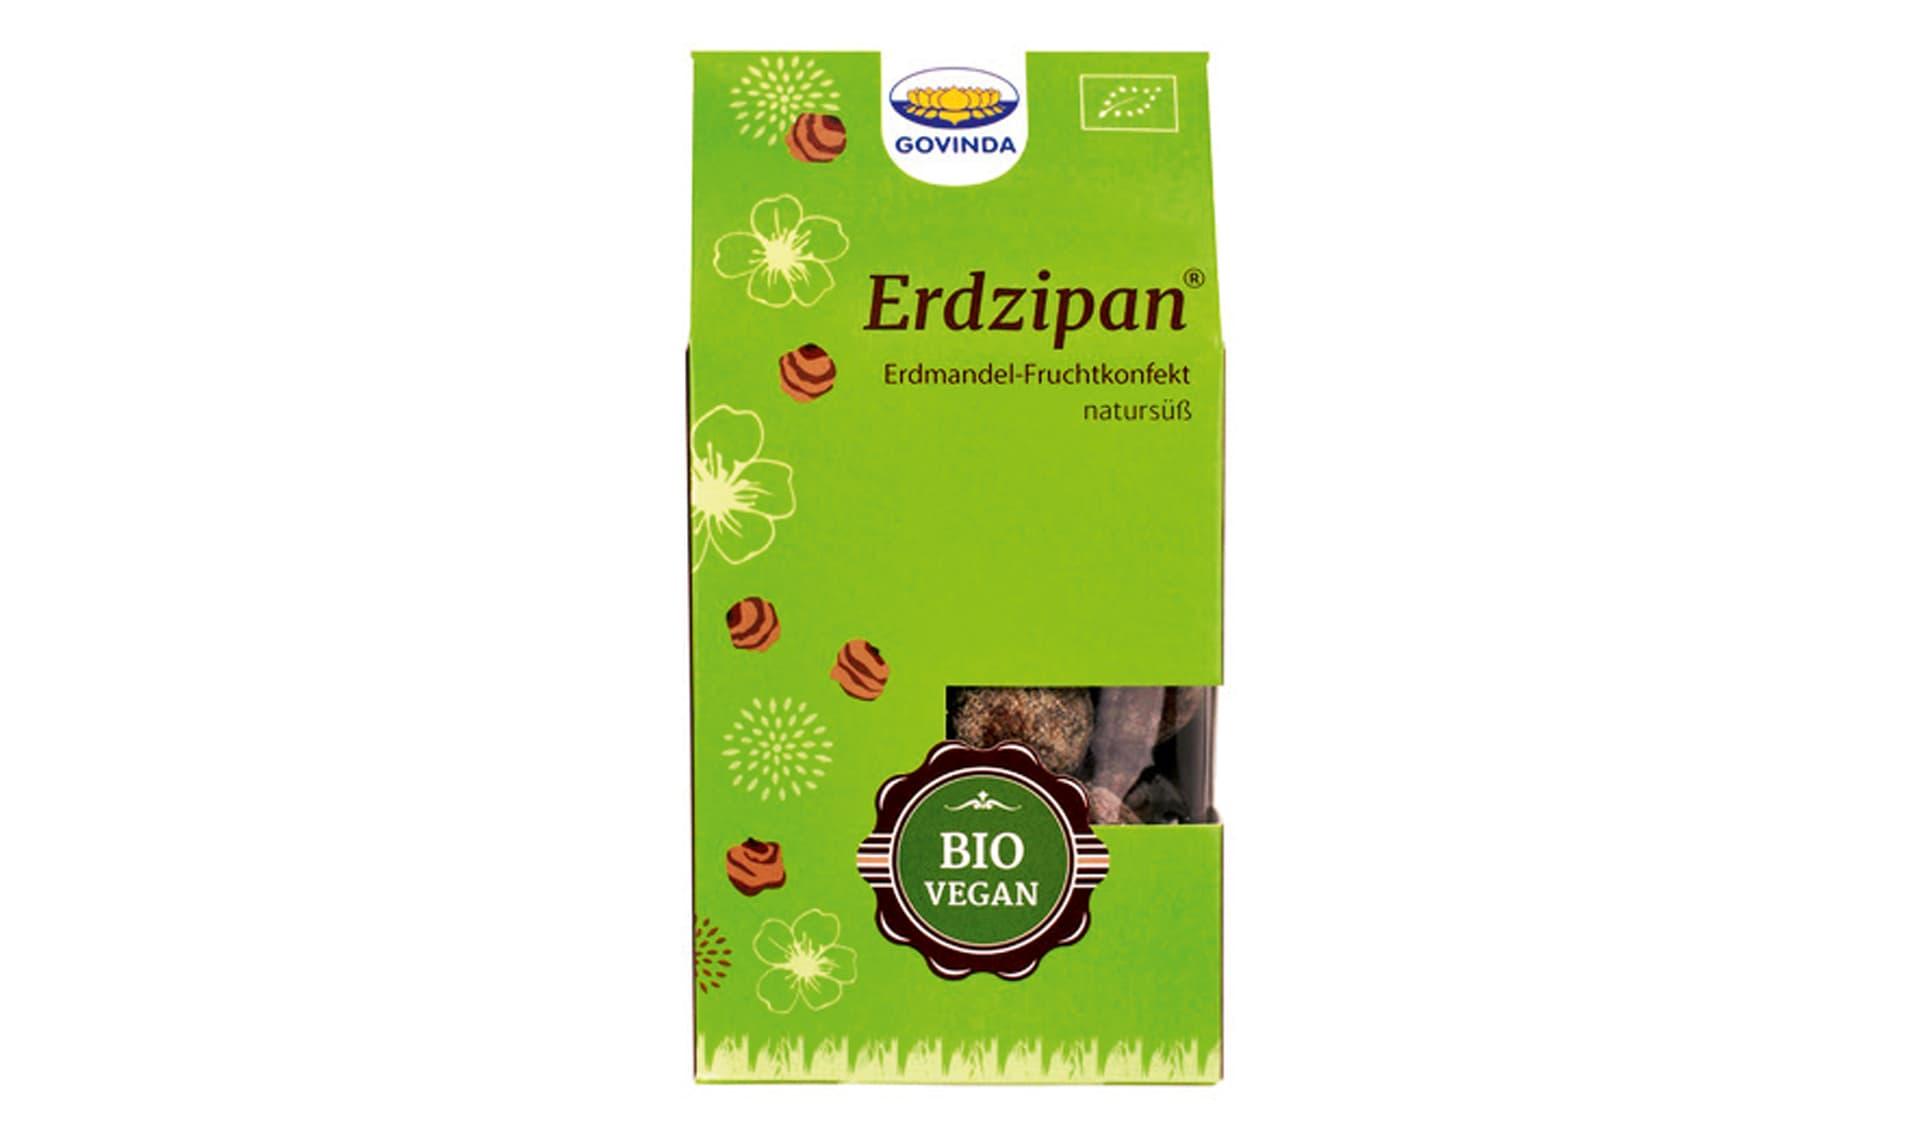 Govinda Erdzipan (www.govinda-natur.de)